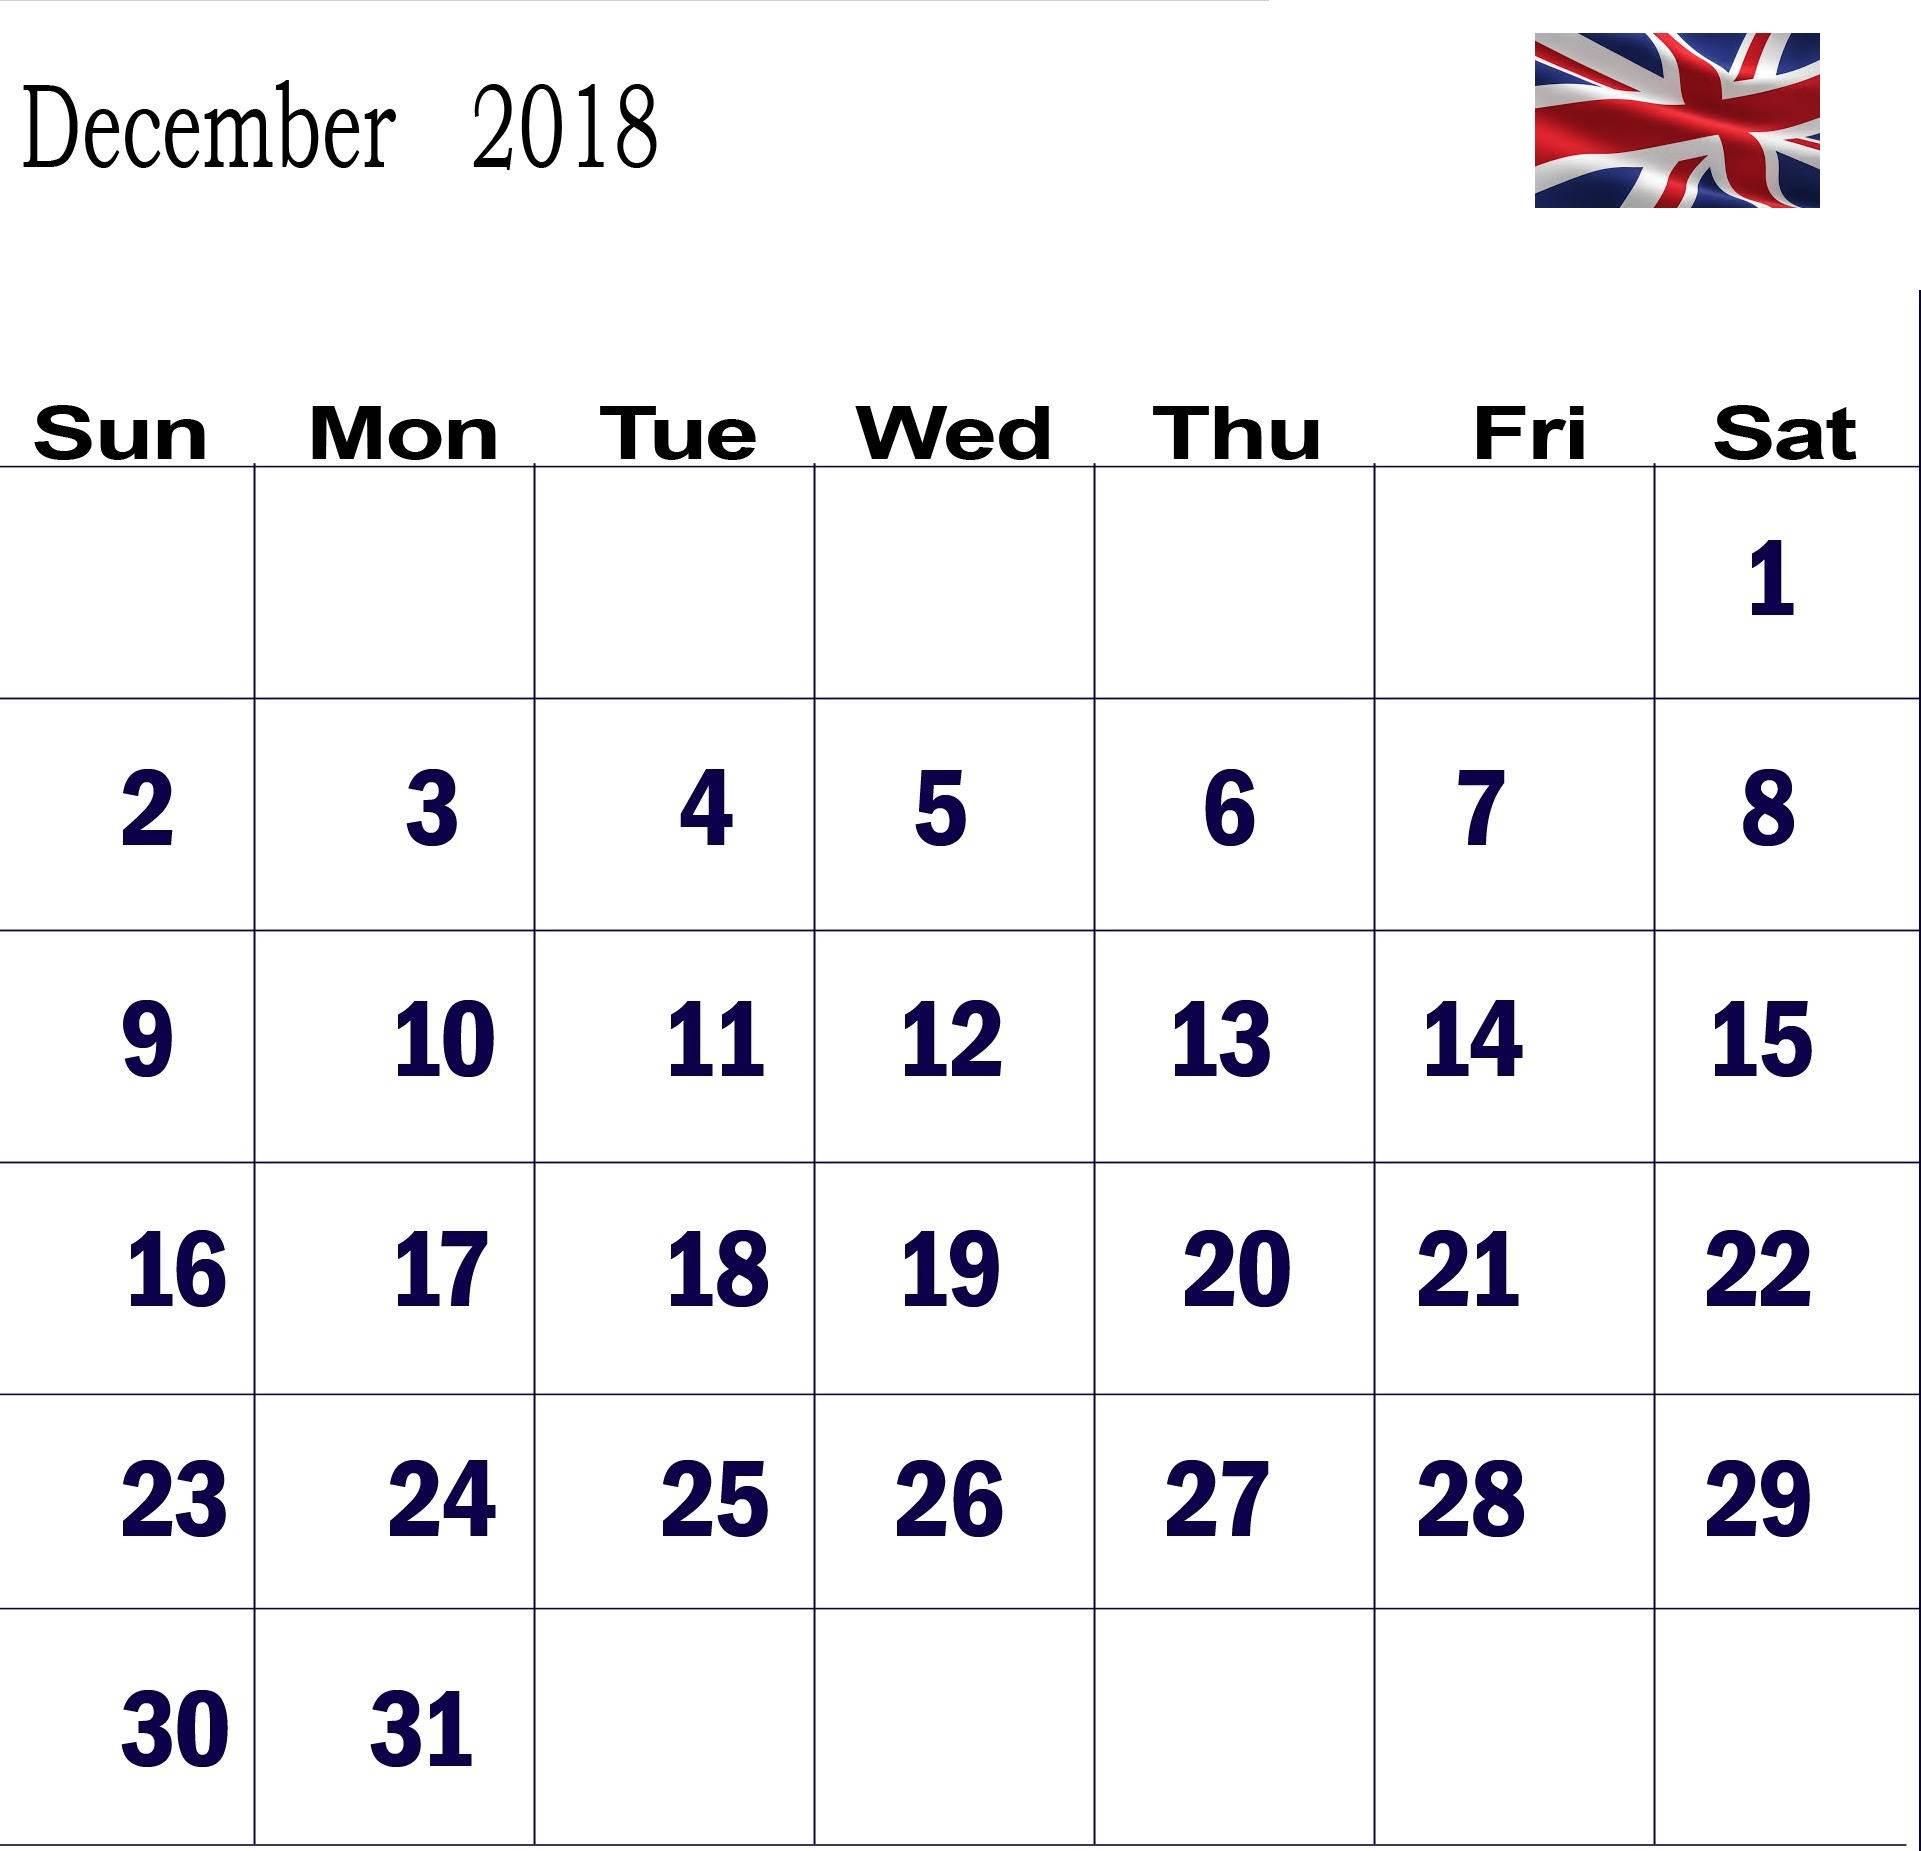 December 2018 Calendar UK With Holidays